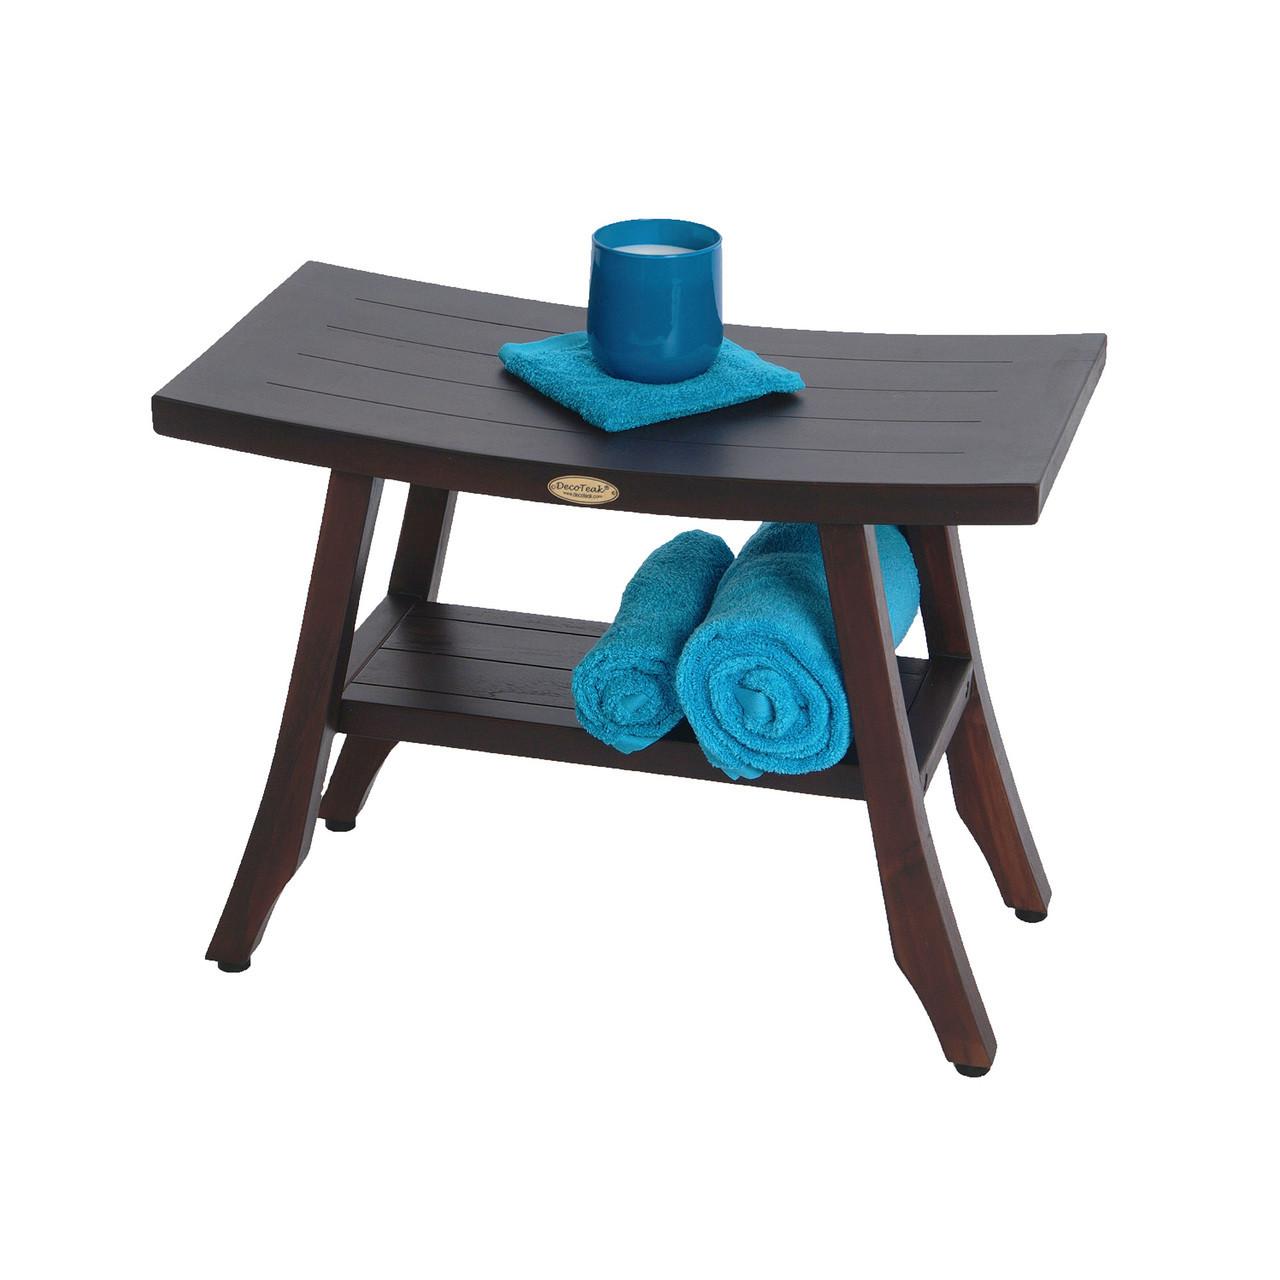 "DecoTeak Satori 24"" Teak Wood Shower Bench with Shelf in Woodland Brown Finish"